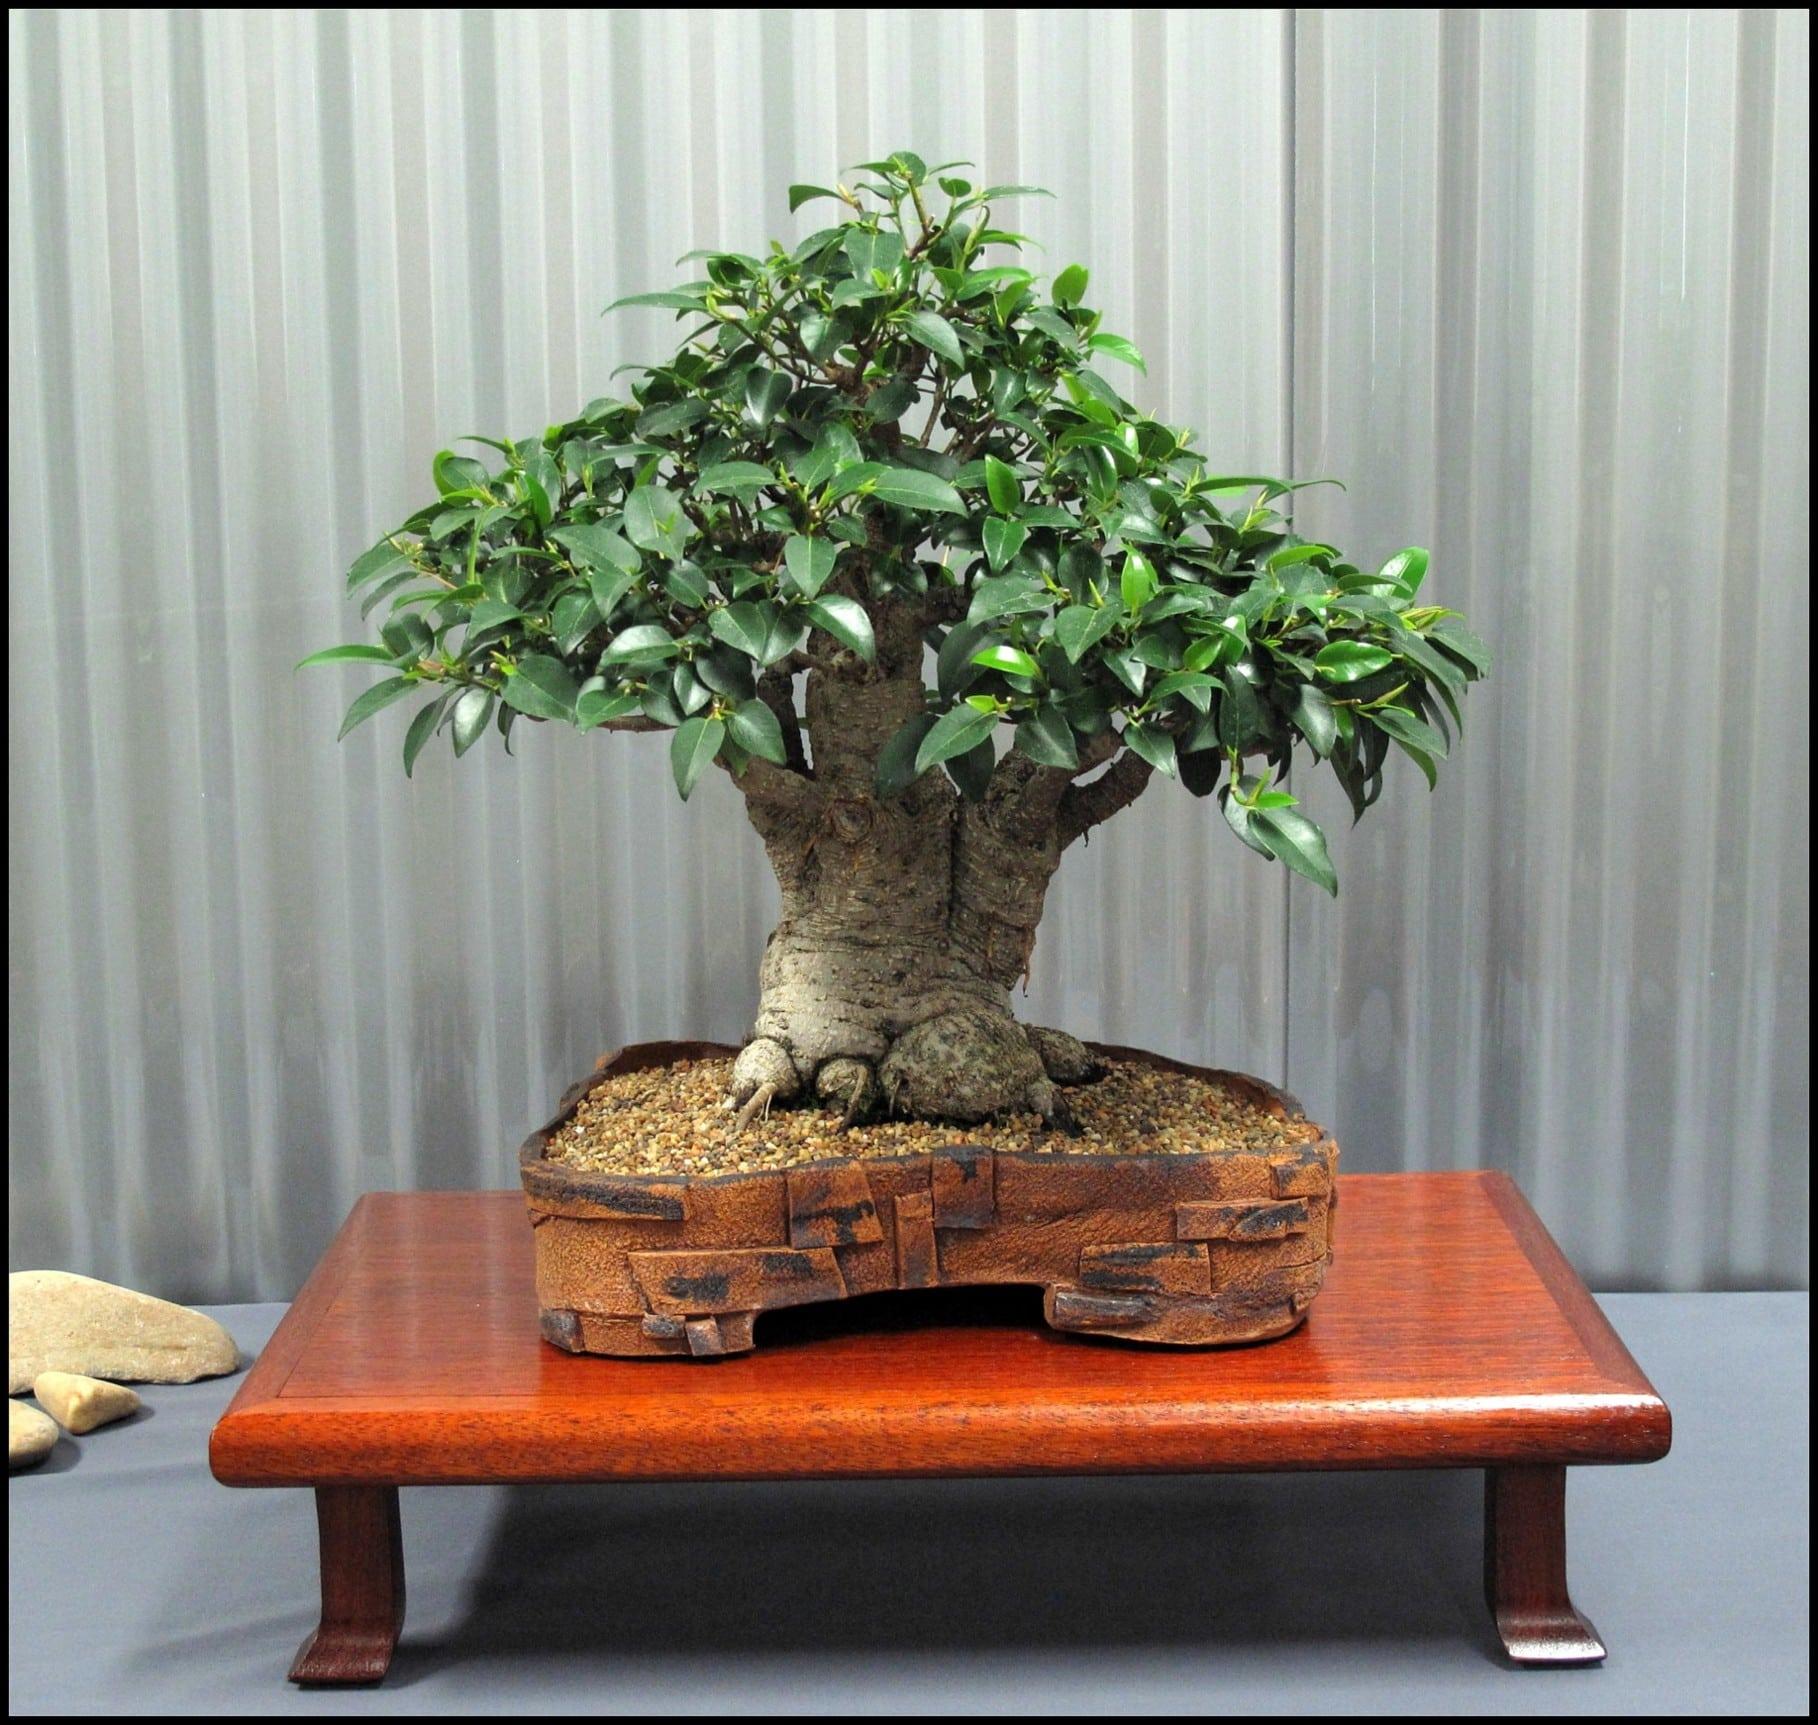 How to learn bonsai